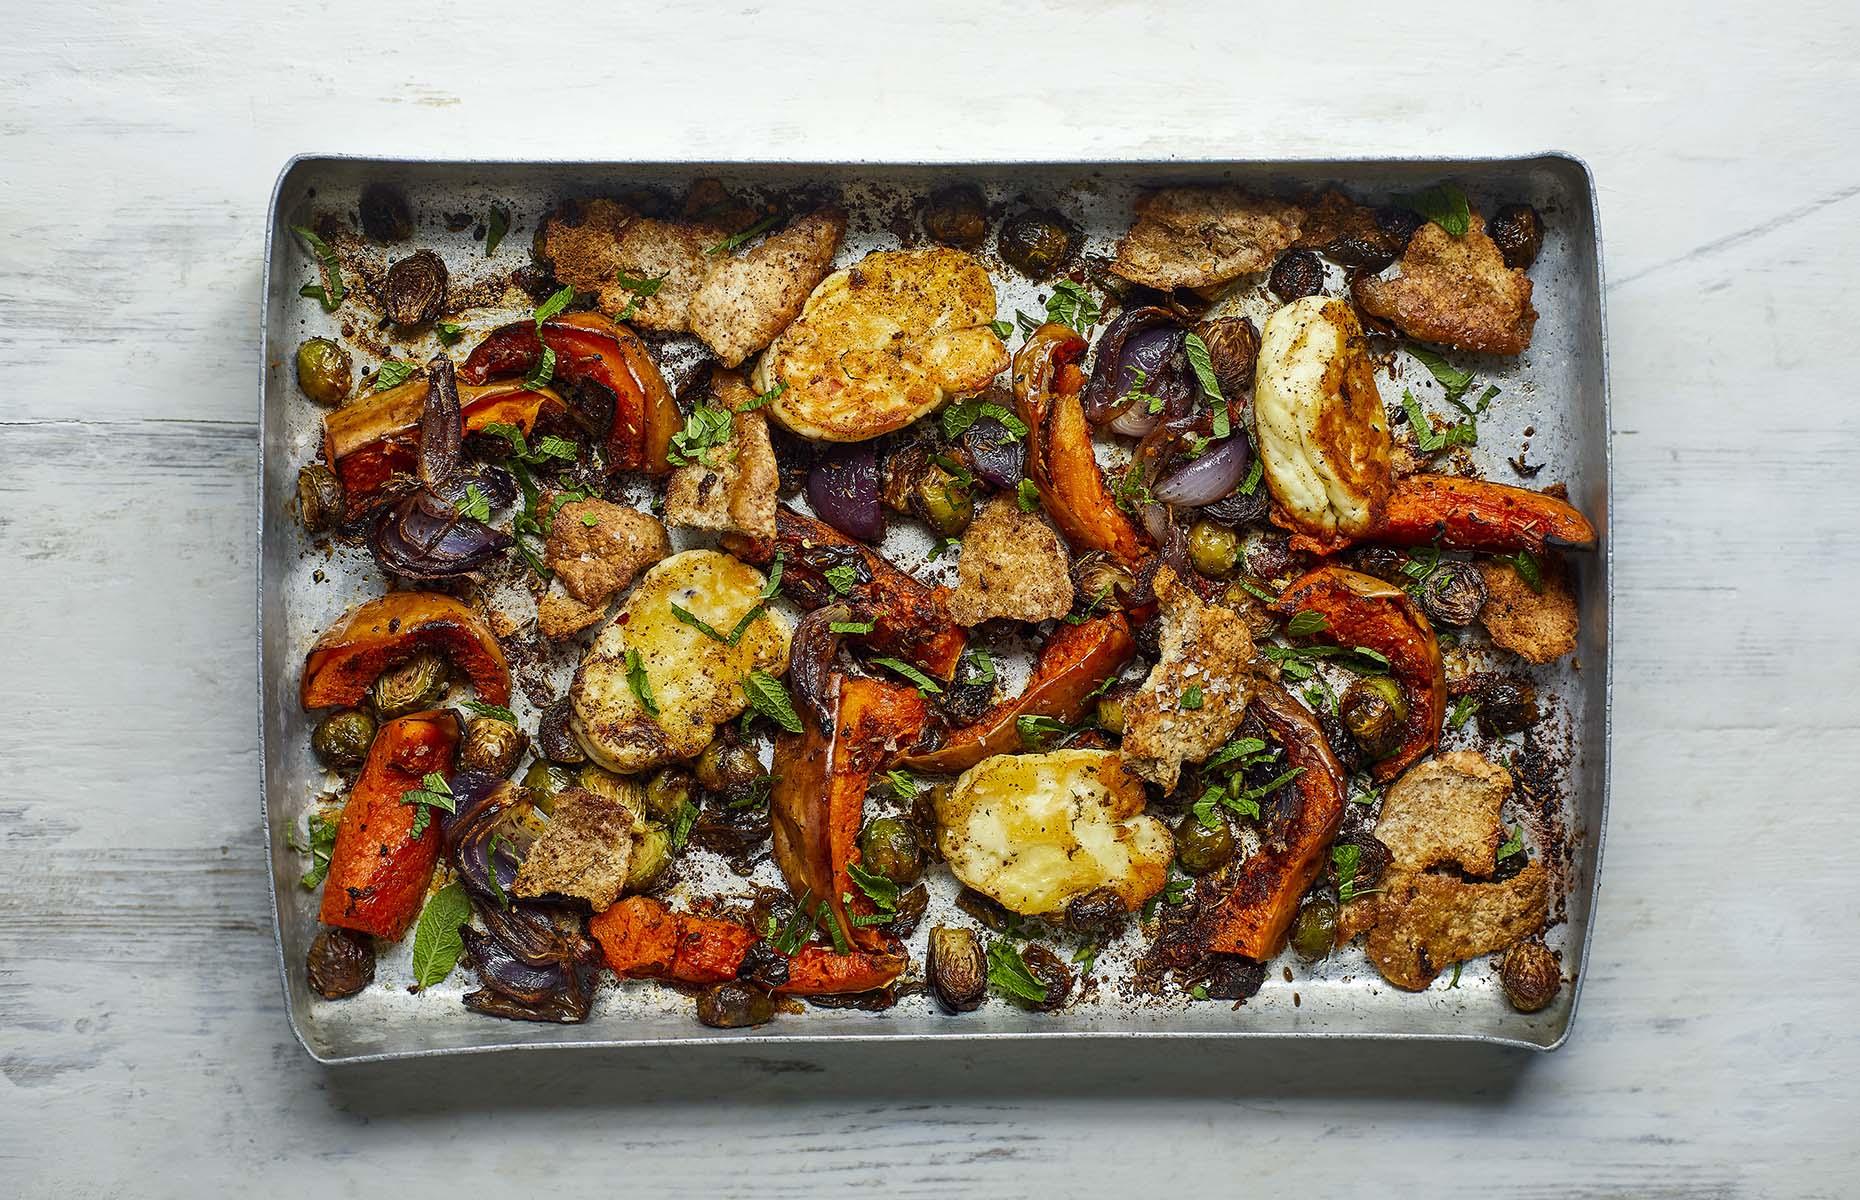 Halloumi vegetable traybake (Image: Doctor's Kitchen 3-2-1/HarperNonFiction)